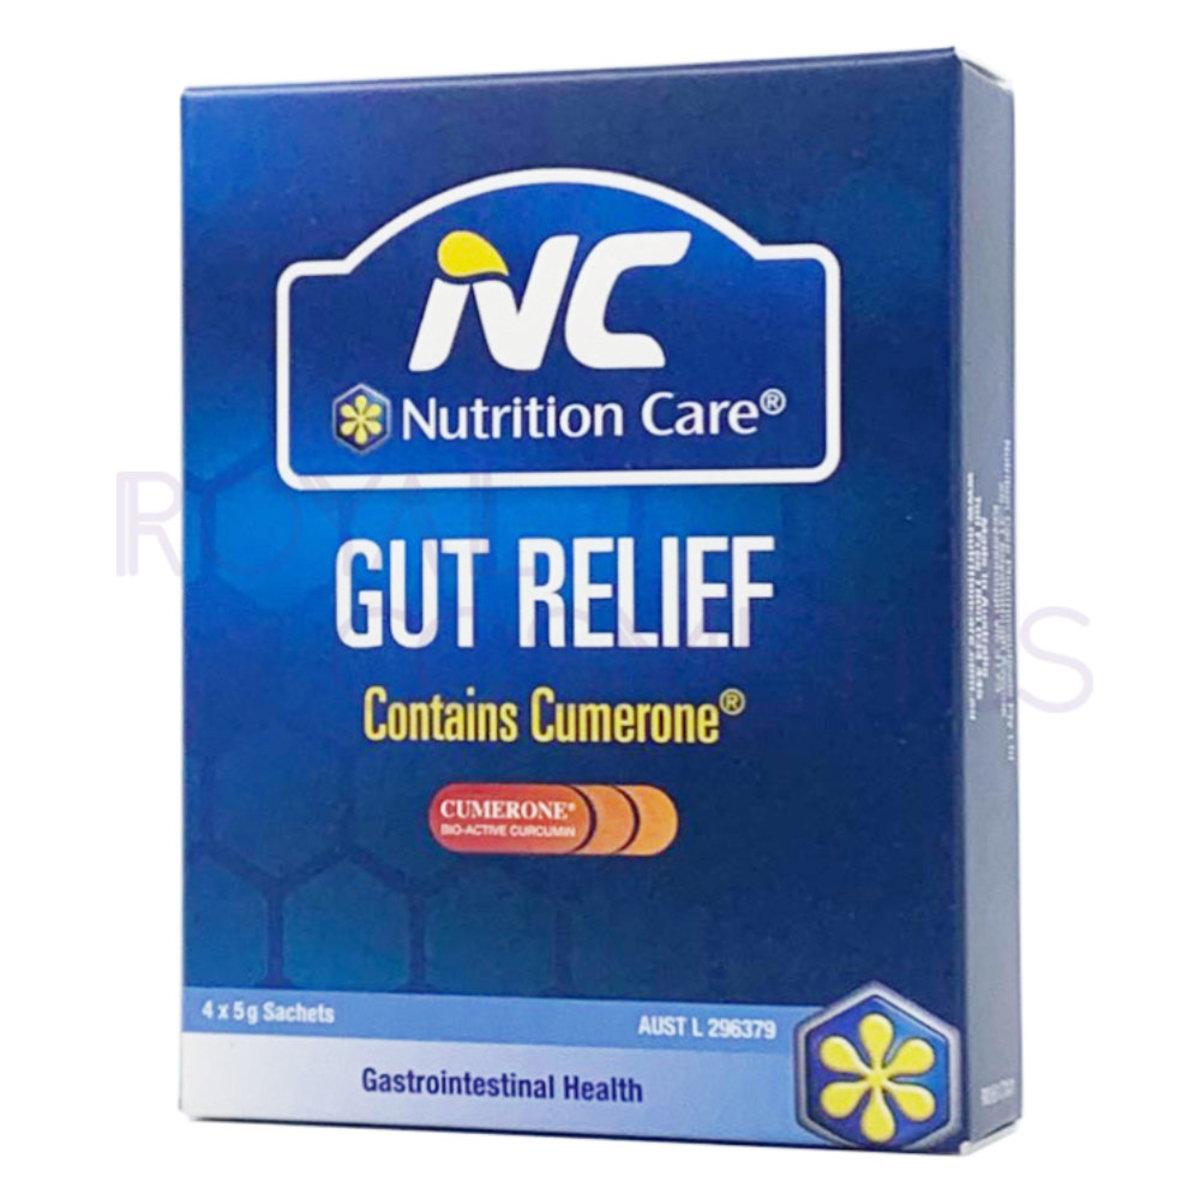 Gut Relief Gastrointestinal Health Powder 5g x 4 EXP:2021.02 [Parallel Import] (9326939005123)